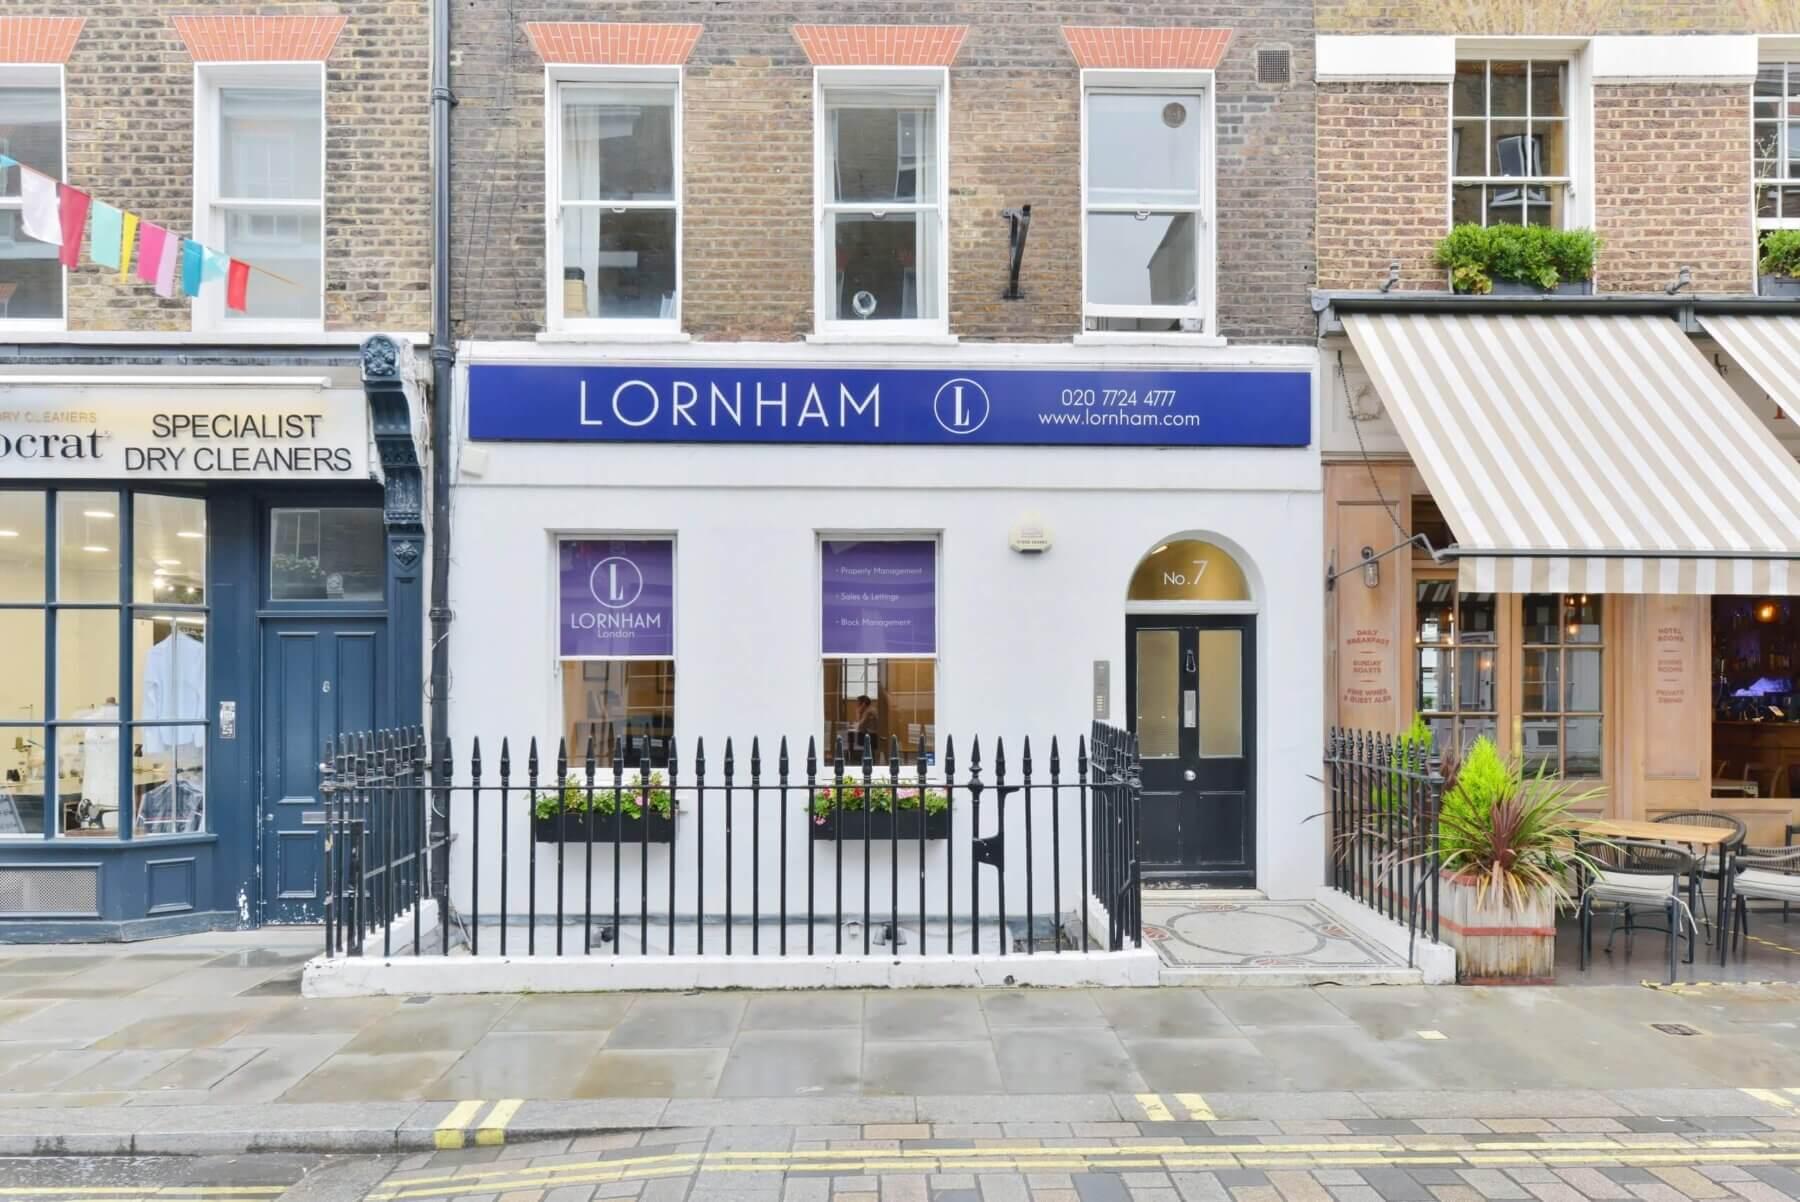 Lornham Office